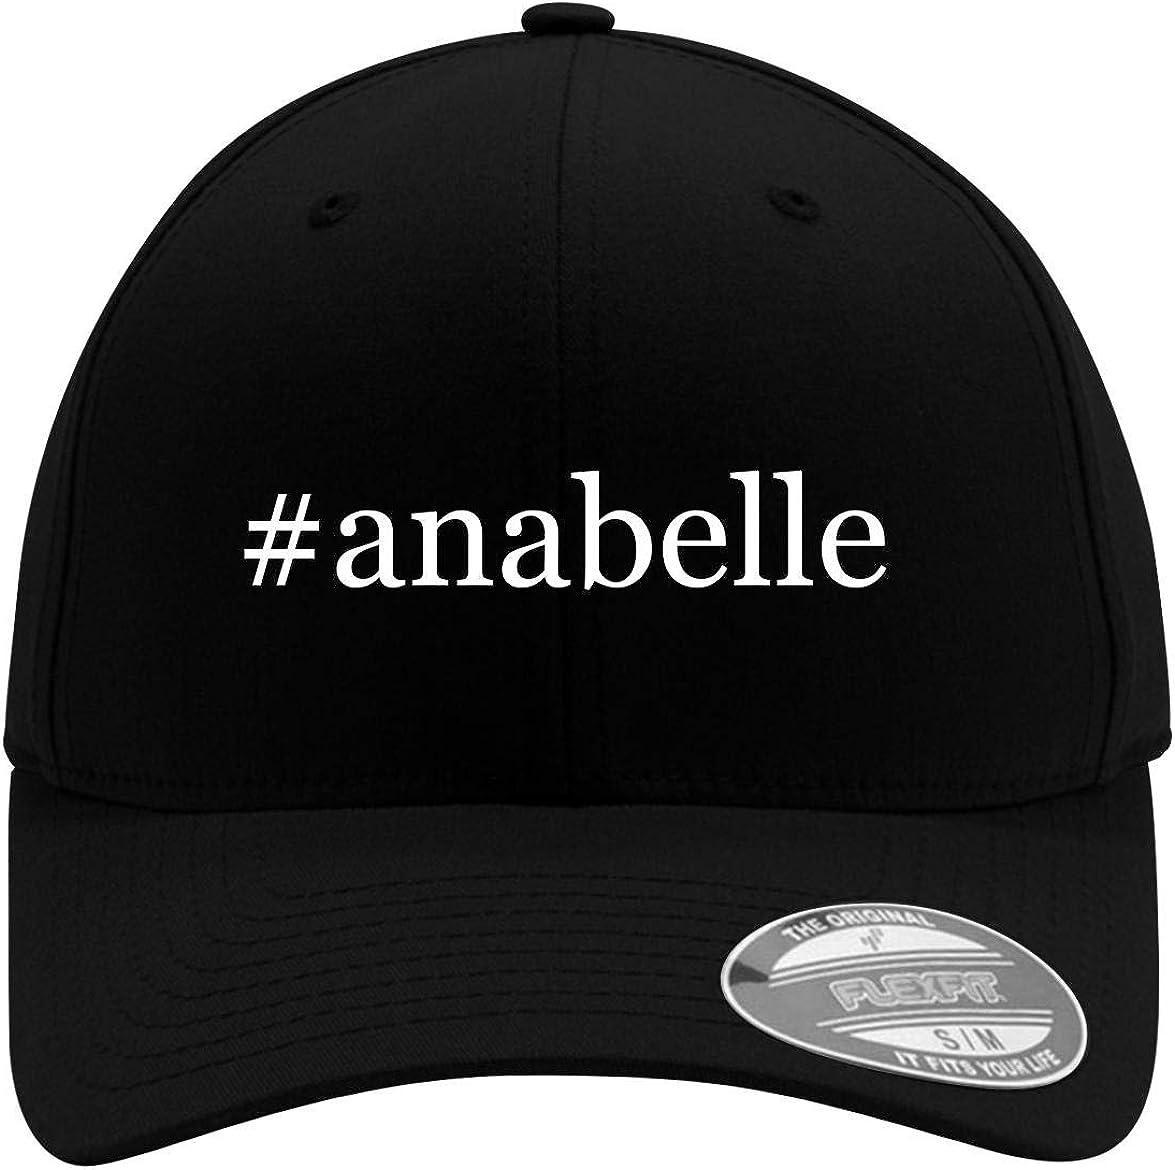 #anabelle - Adult Men's Hashtag Flexfit Baseball Hat Cap 61s0KKjTHOL